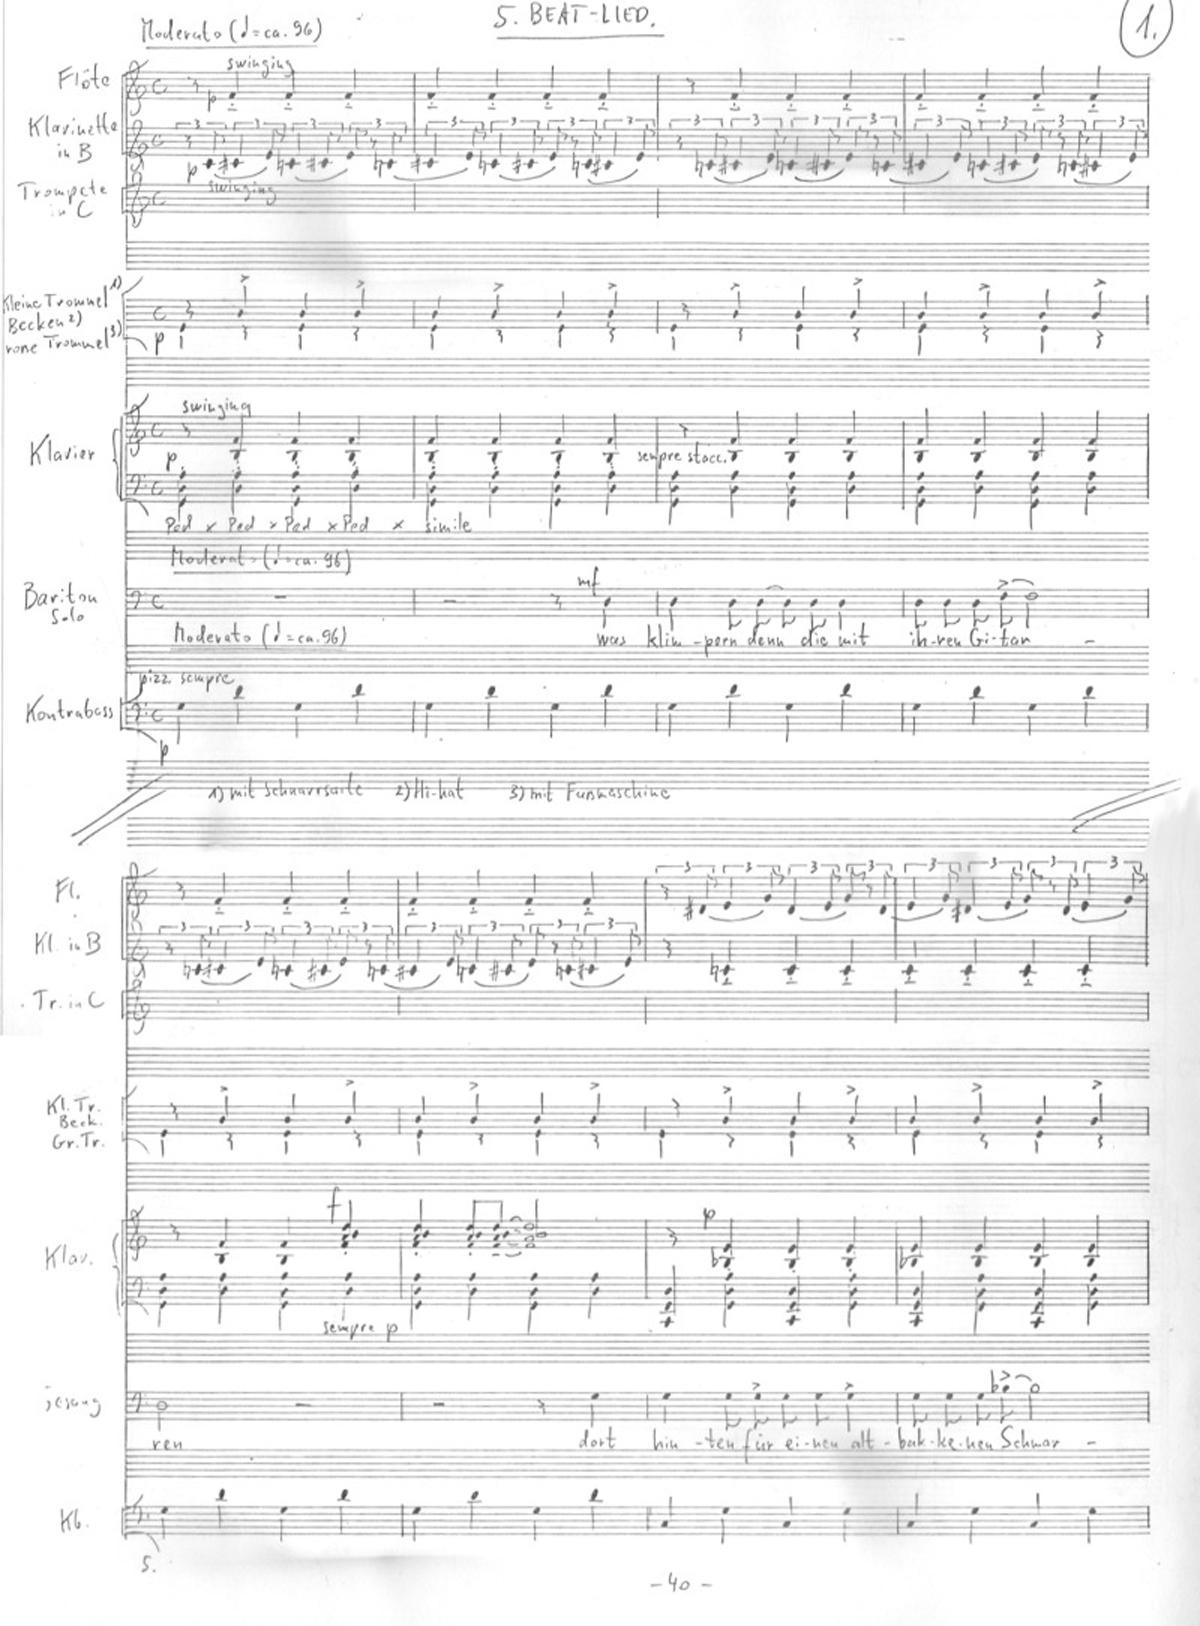 Ivan Eröd, Manuskript - Krokodilslieder Op. 28 / © Musikverlag Doblinger, abgebildet mit freundicher Genehmigung des Verlages